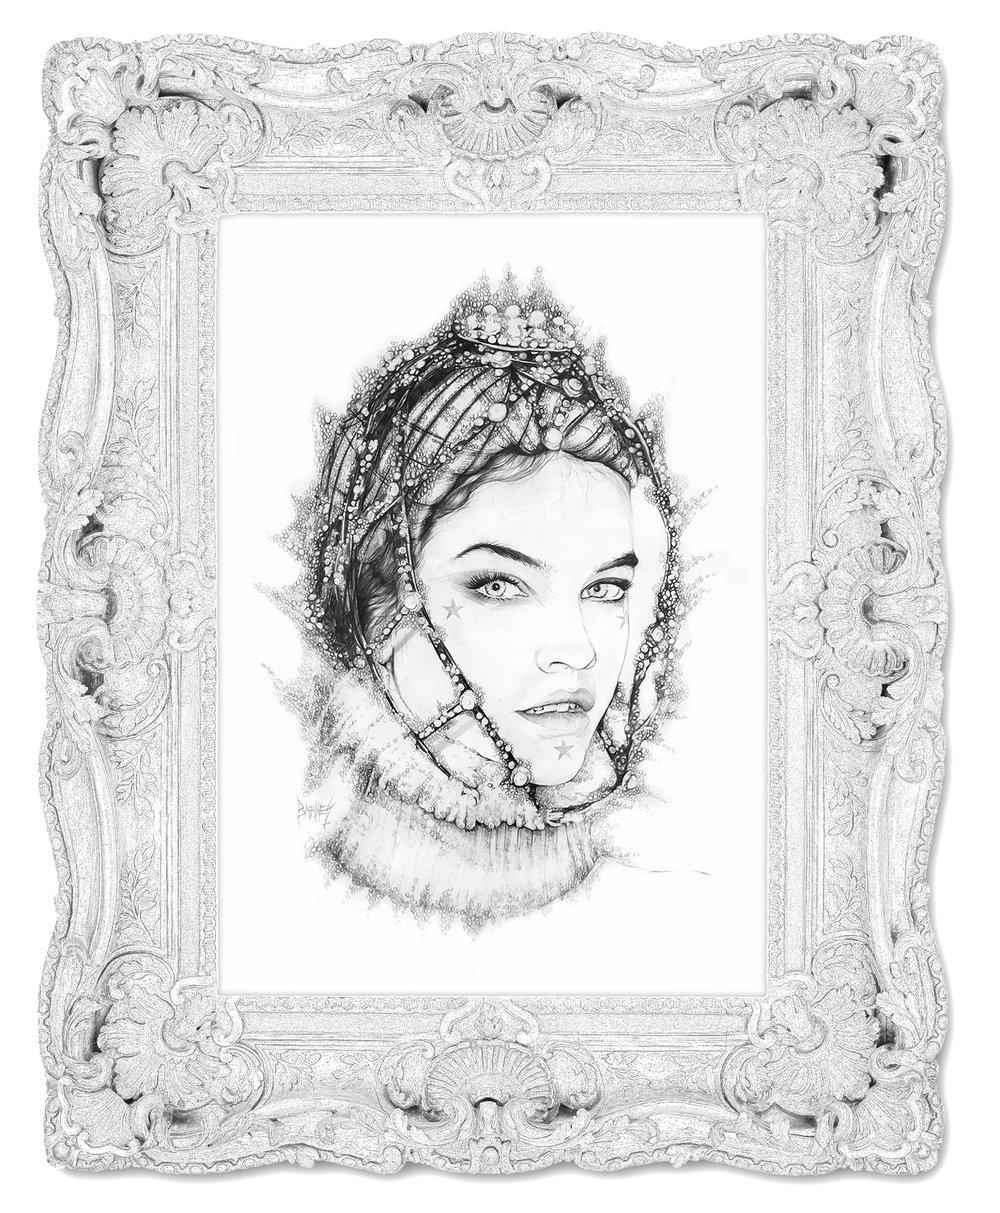 BBKUNST-Art-Artist-Bryan-Barnes-Pencil-Art-Drawing_Barbara_Palvin_Hungarian_Princess_Under_An_Aquarius_Moon_Frame.jpg